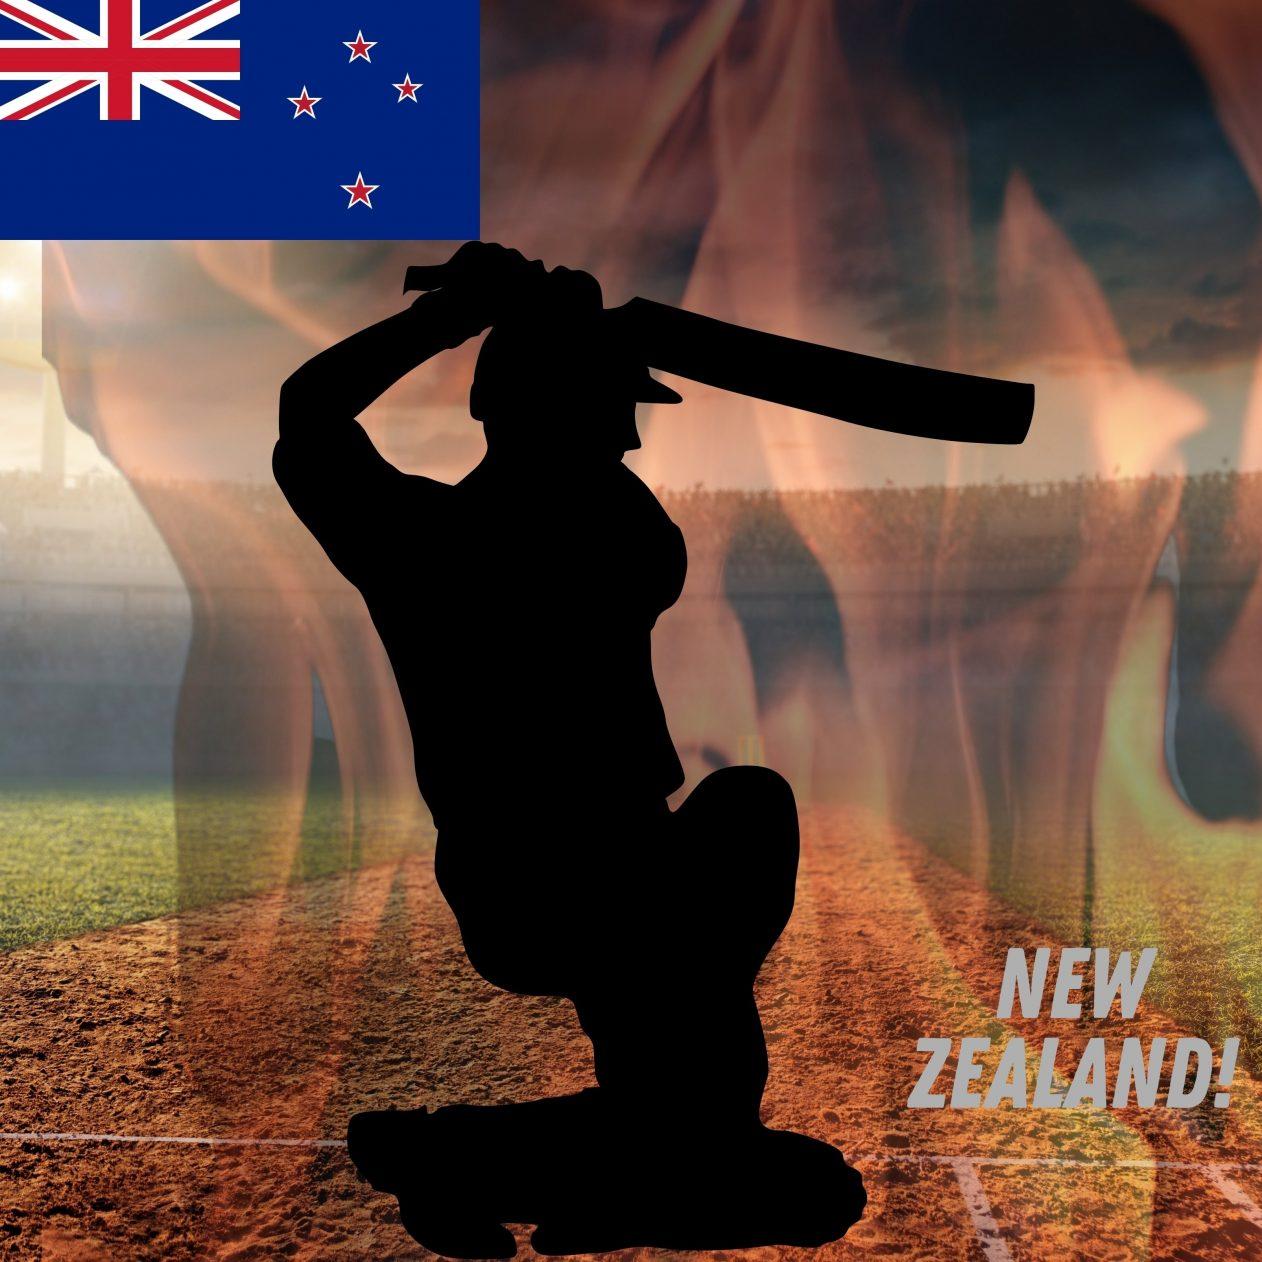 1262x1262 Parallax wallpaper 4k New Zealand Cricket Stadium iPad Wallpaper 1262x1262 pixels resolution